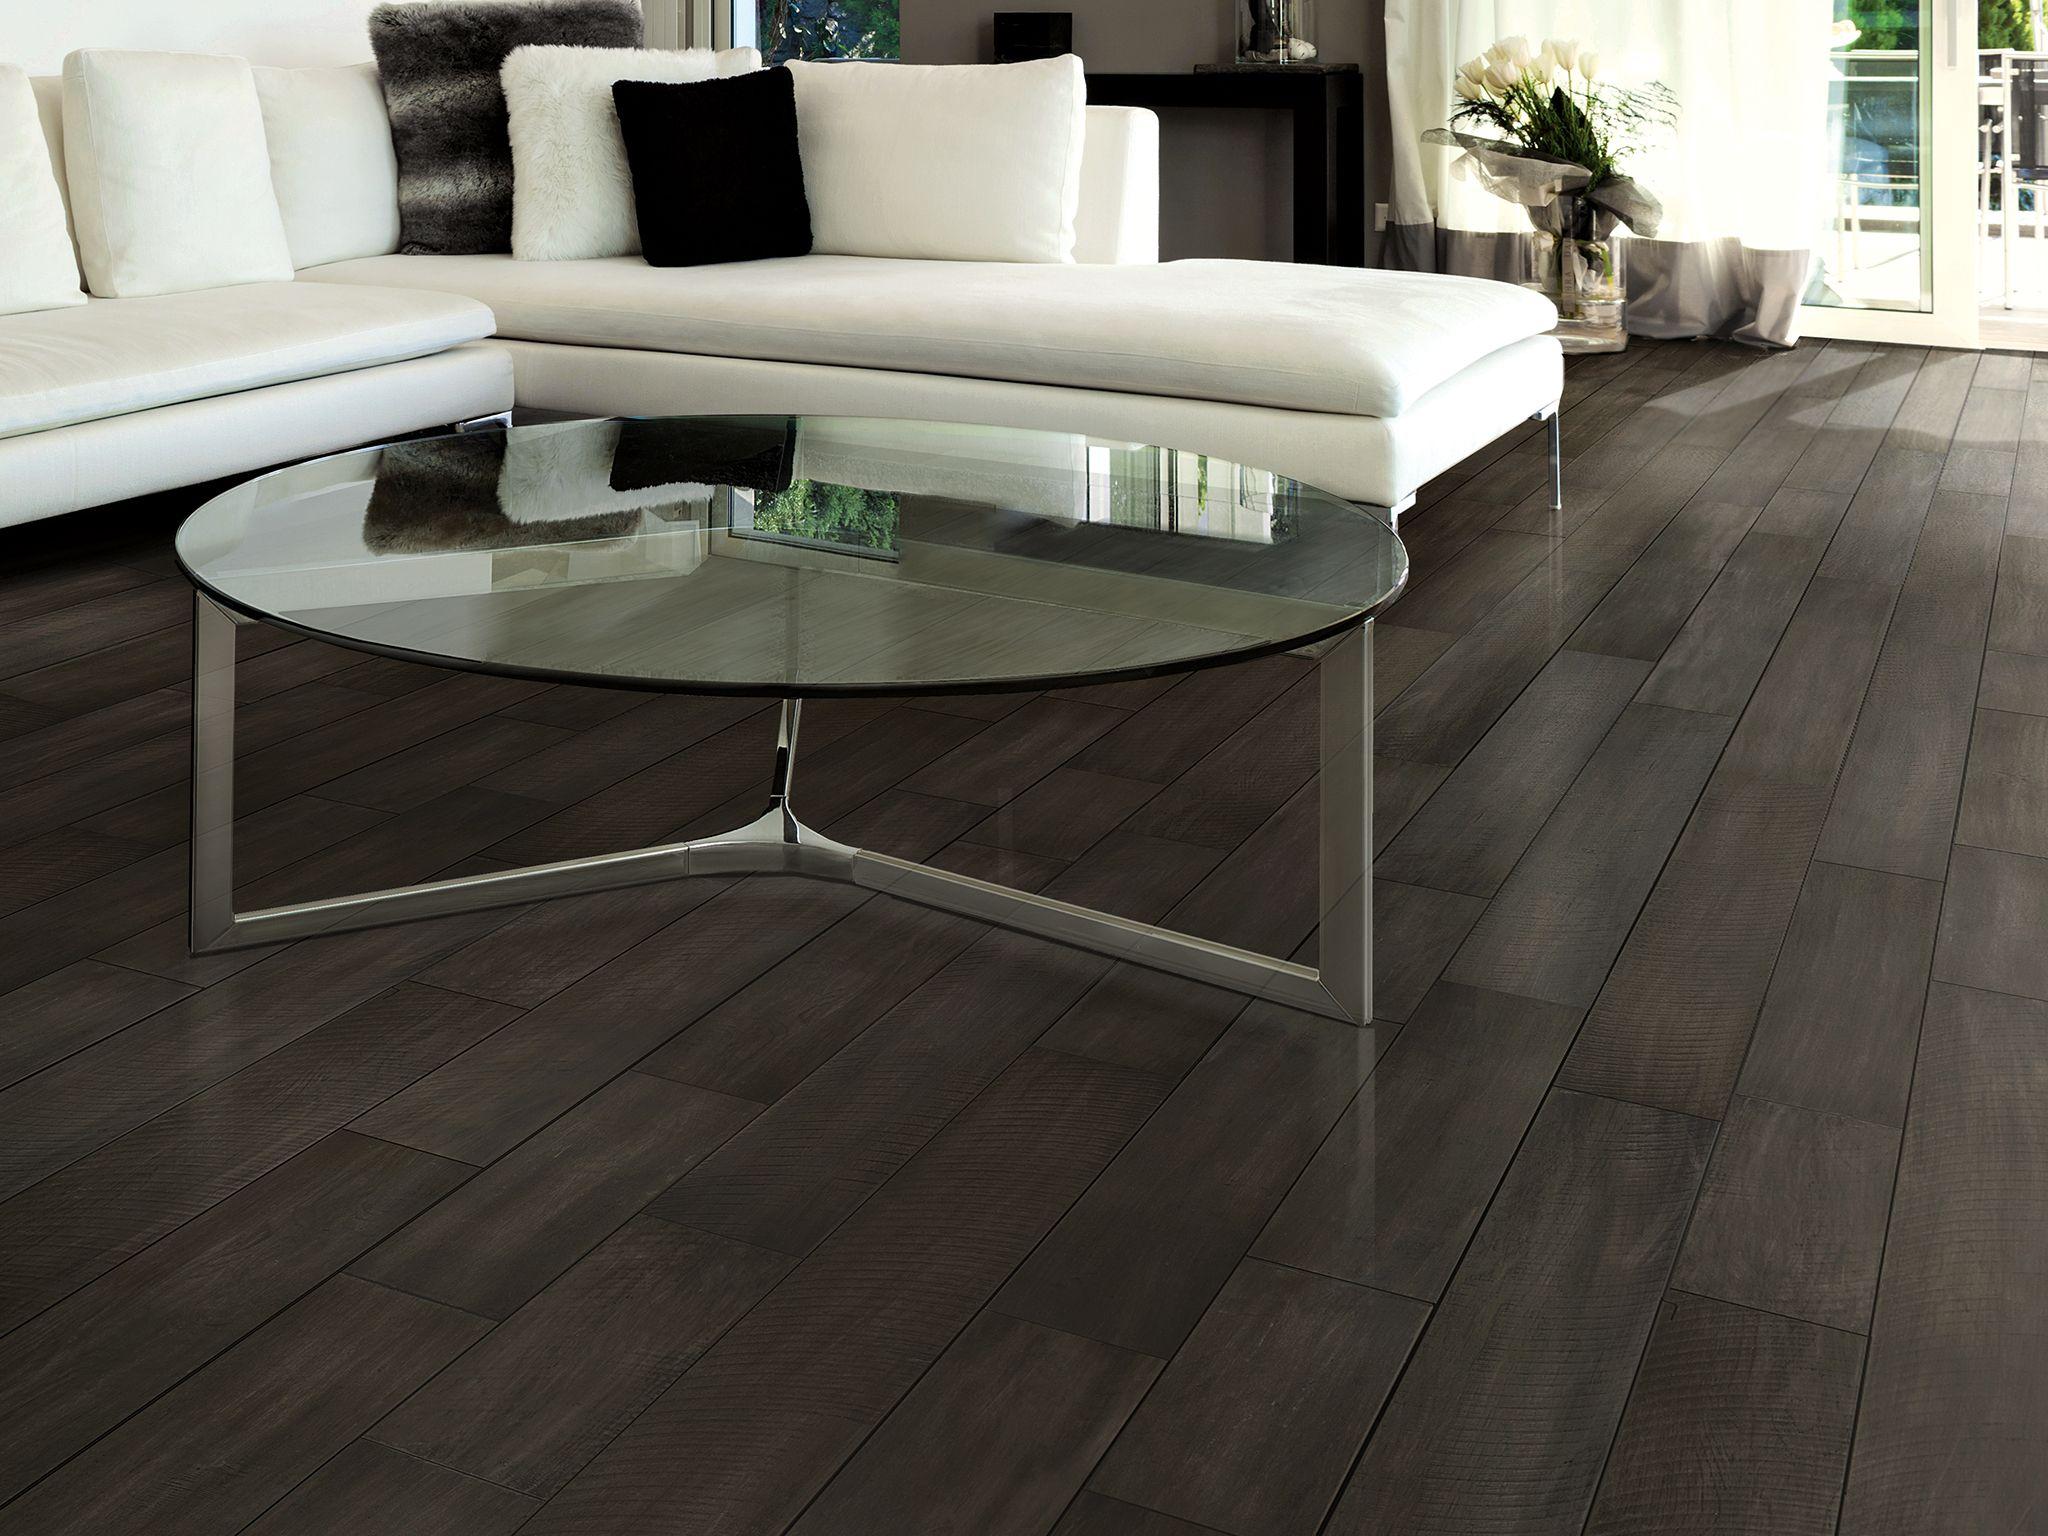 Barnwood Hickory Paramount Flooring Hardwood floors